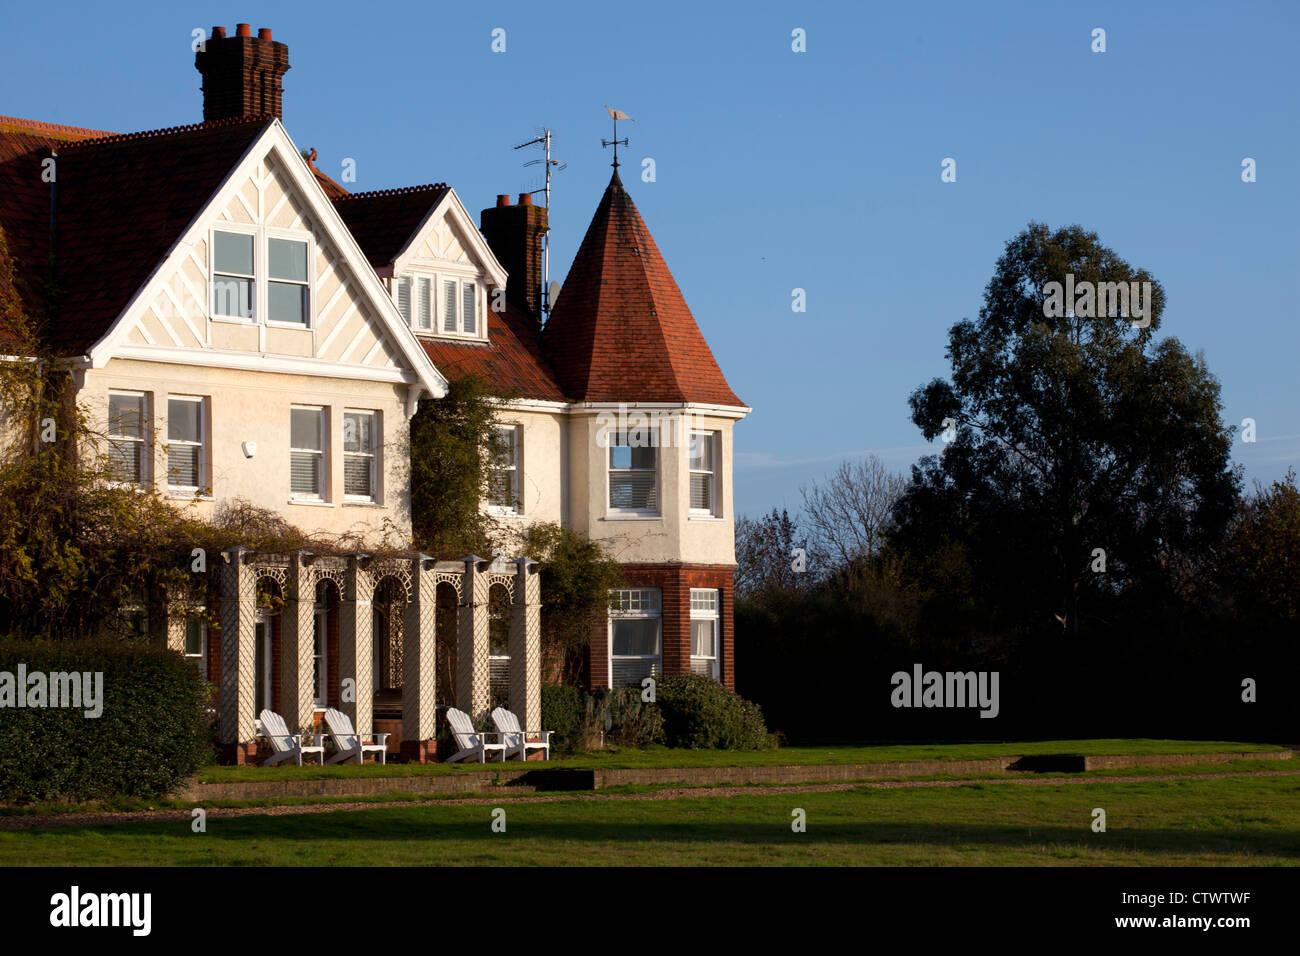 Osea Island, Essex, England, UK - Stock Image